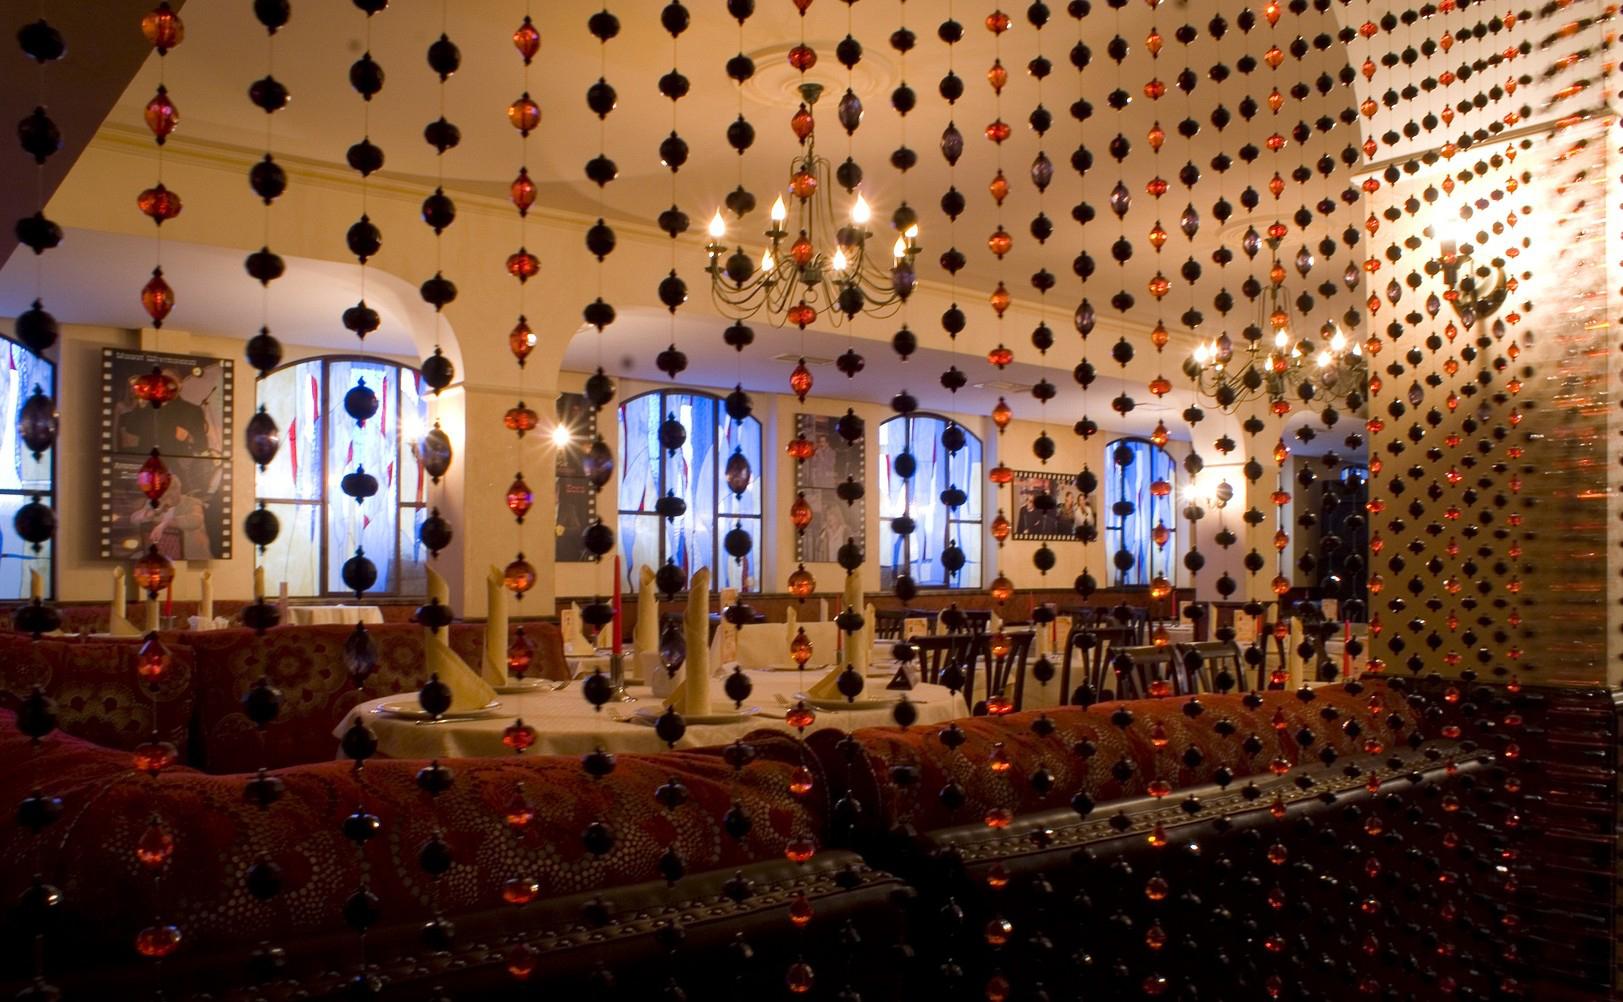 шторы из бусин дизайн